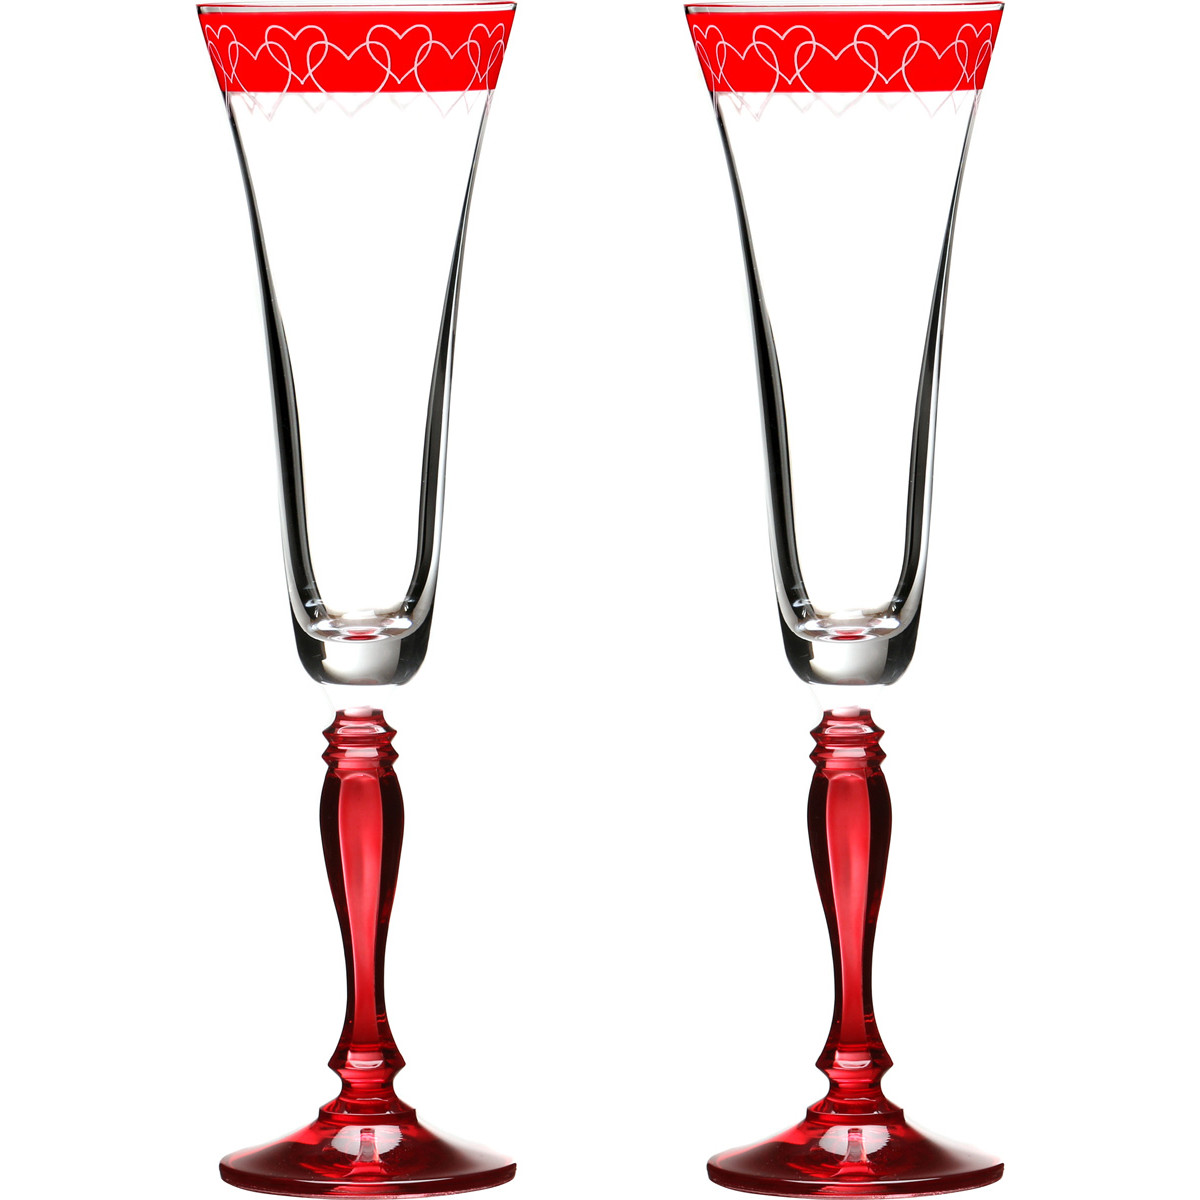 {} Bohemia Crystal Набор бокалов для шампанского Felina (25 см - 2 шт) bohemia crystal набор бокалов для шампанского felina 25 см 2 шт